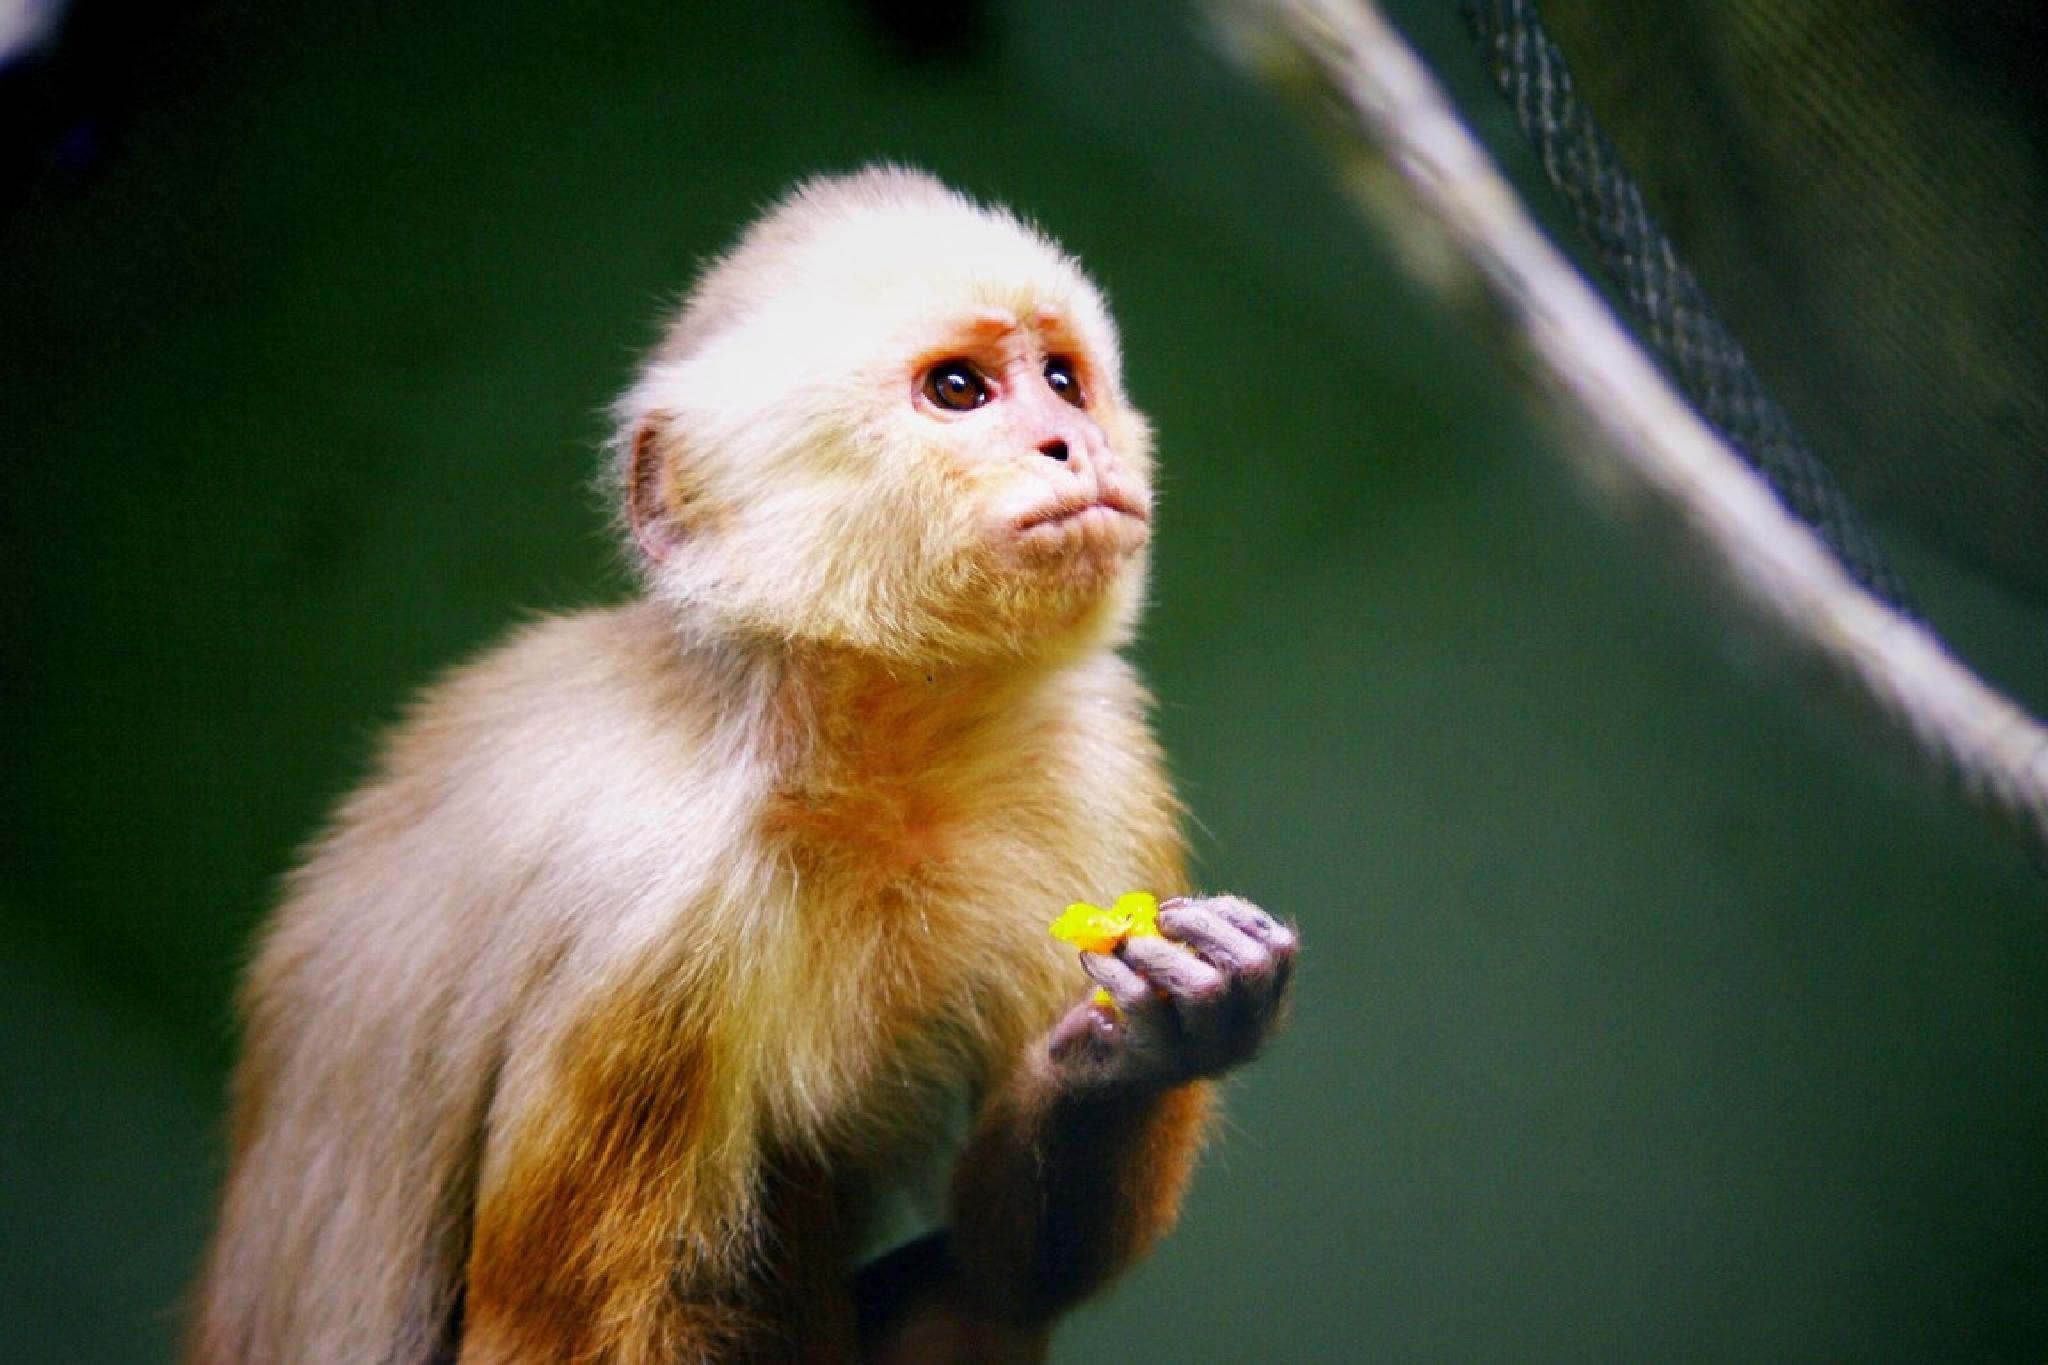 Sad little capuchino by Dan Steeves